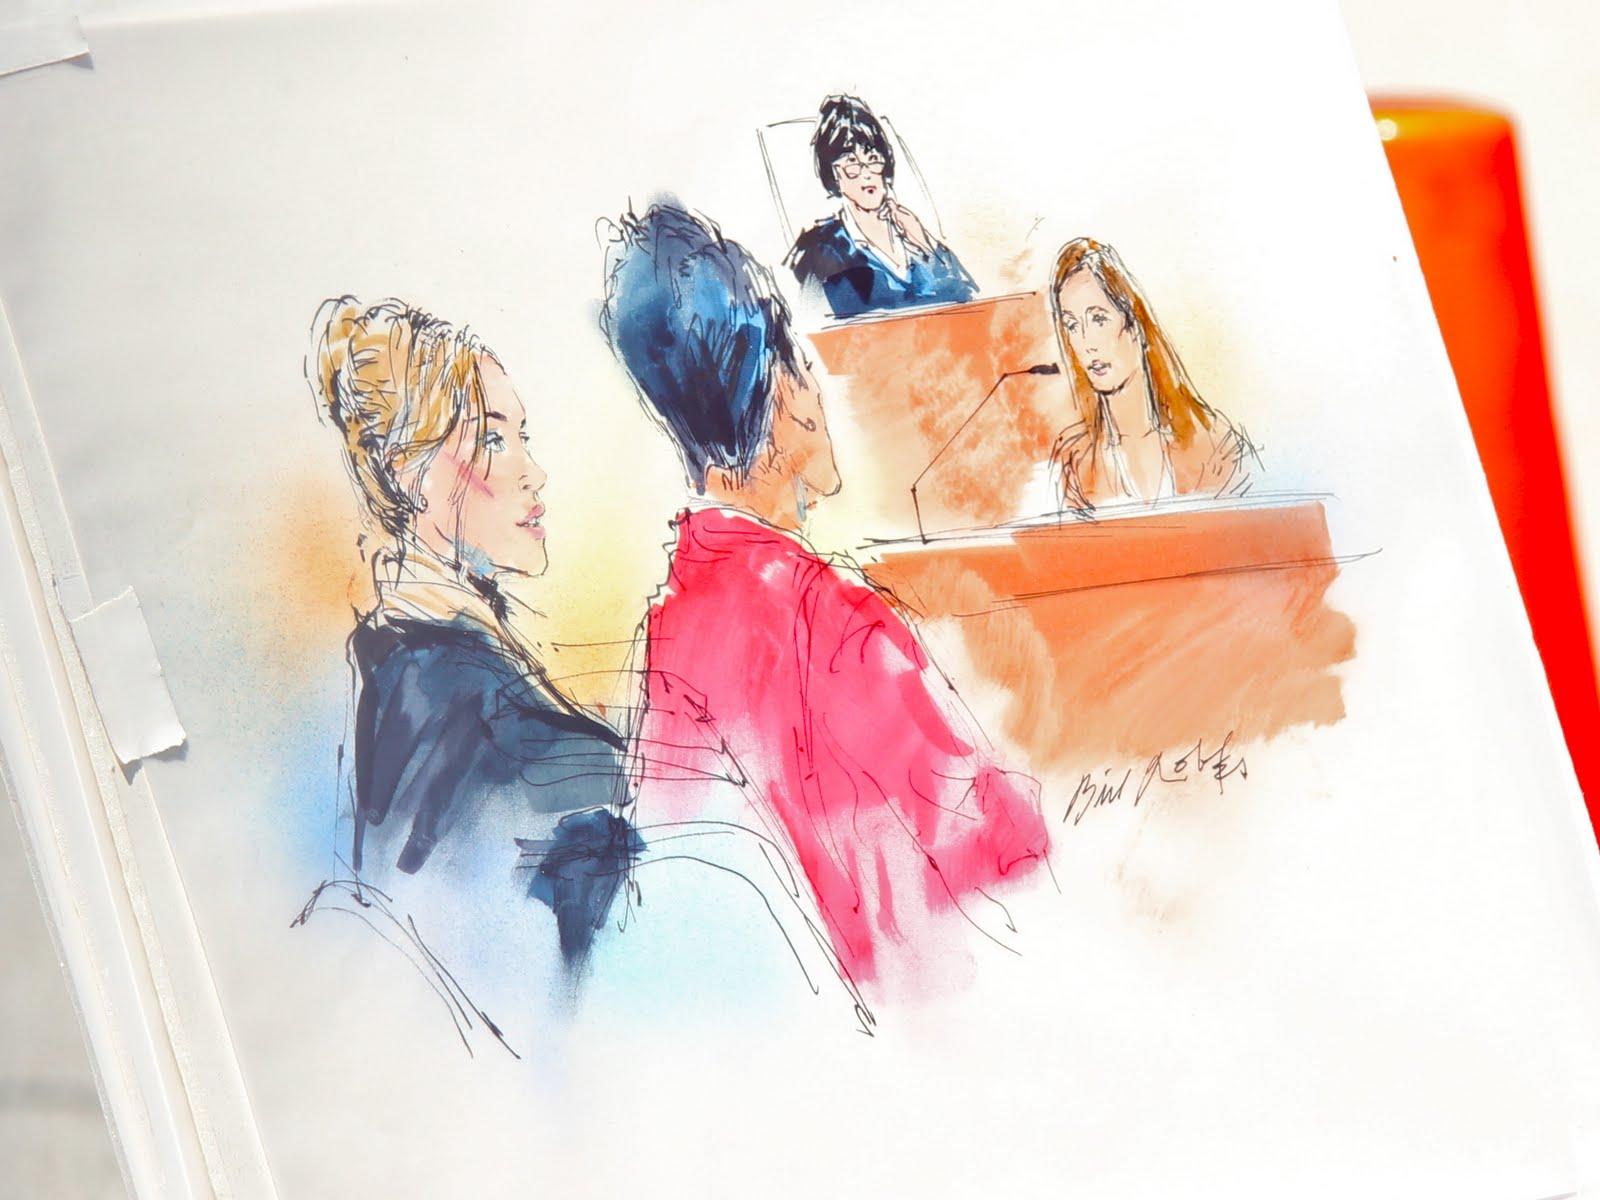 http://3.bp.blogspot.com/-D5i9wqXXbNA/TbJOGPZ97WI/AAAAAAAAFFg/12RJtP_lgkk/s1600/lindsay_lohan_sketch_court_042211-001.JPG